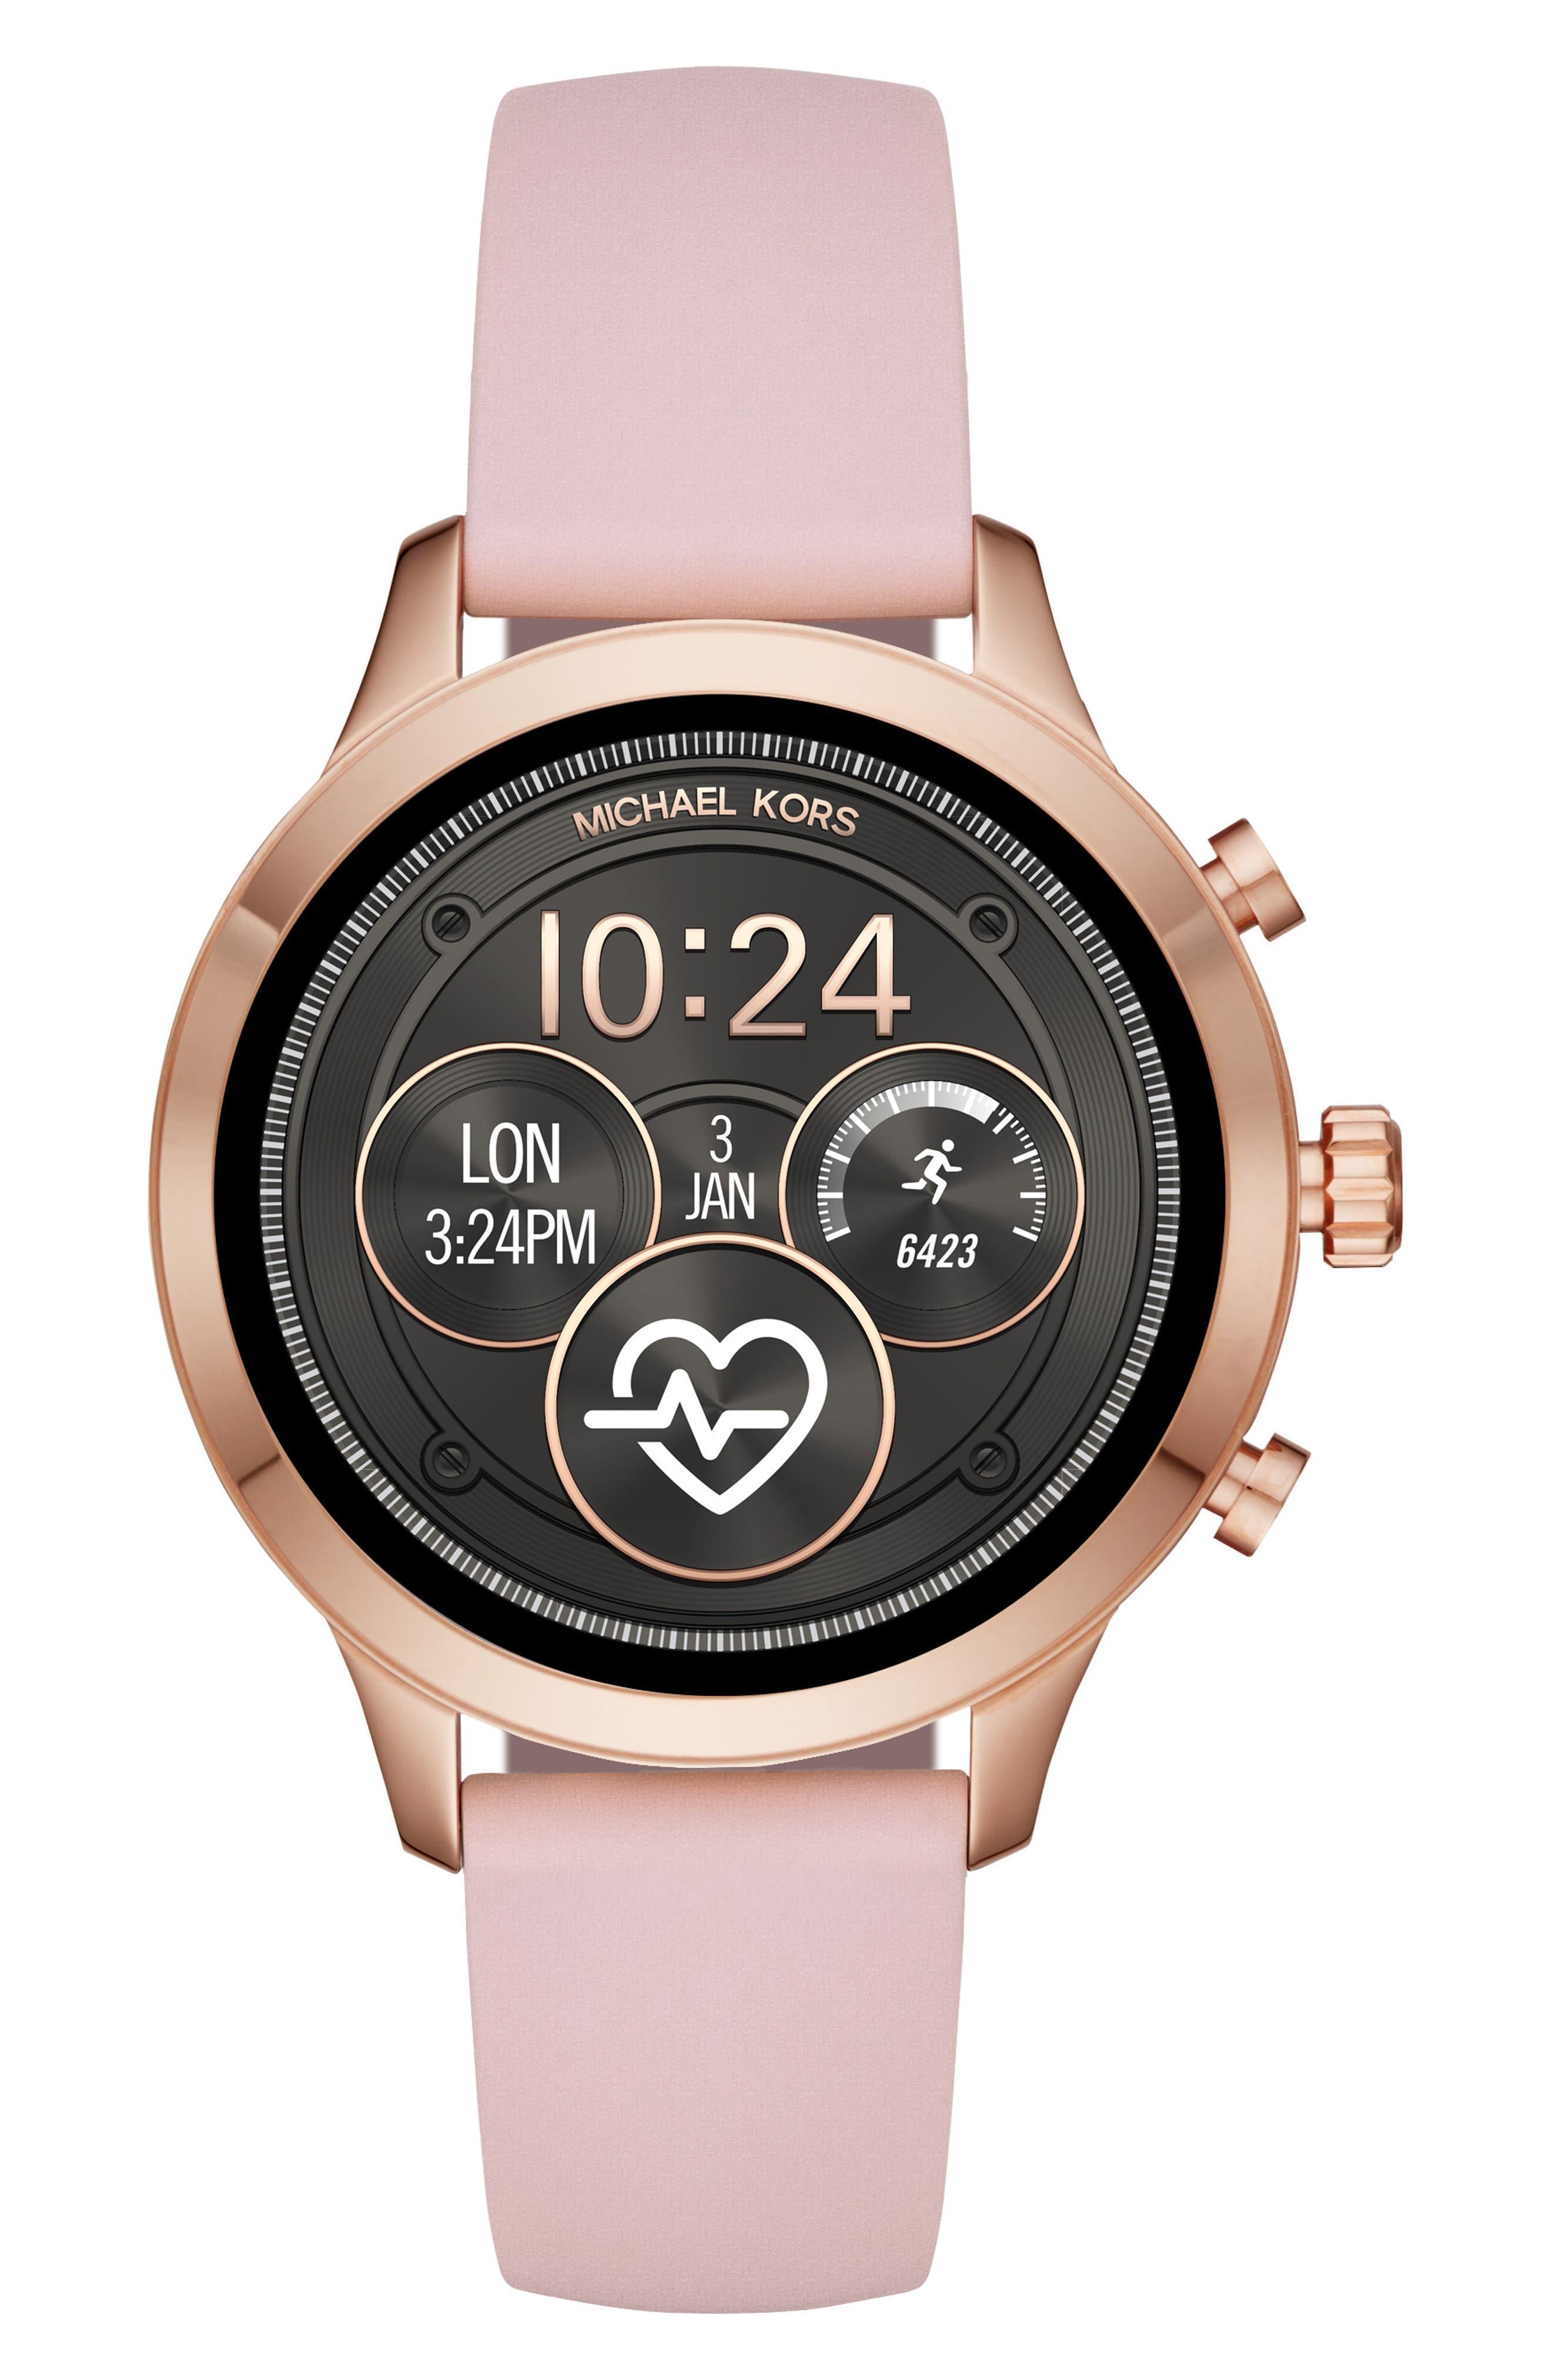 MICHAEL KORS MICHAEL Michael Kors Access Runway Smart Watch, 41mm, Main, color, PINK/ ROSE GOLD